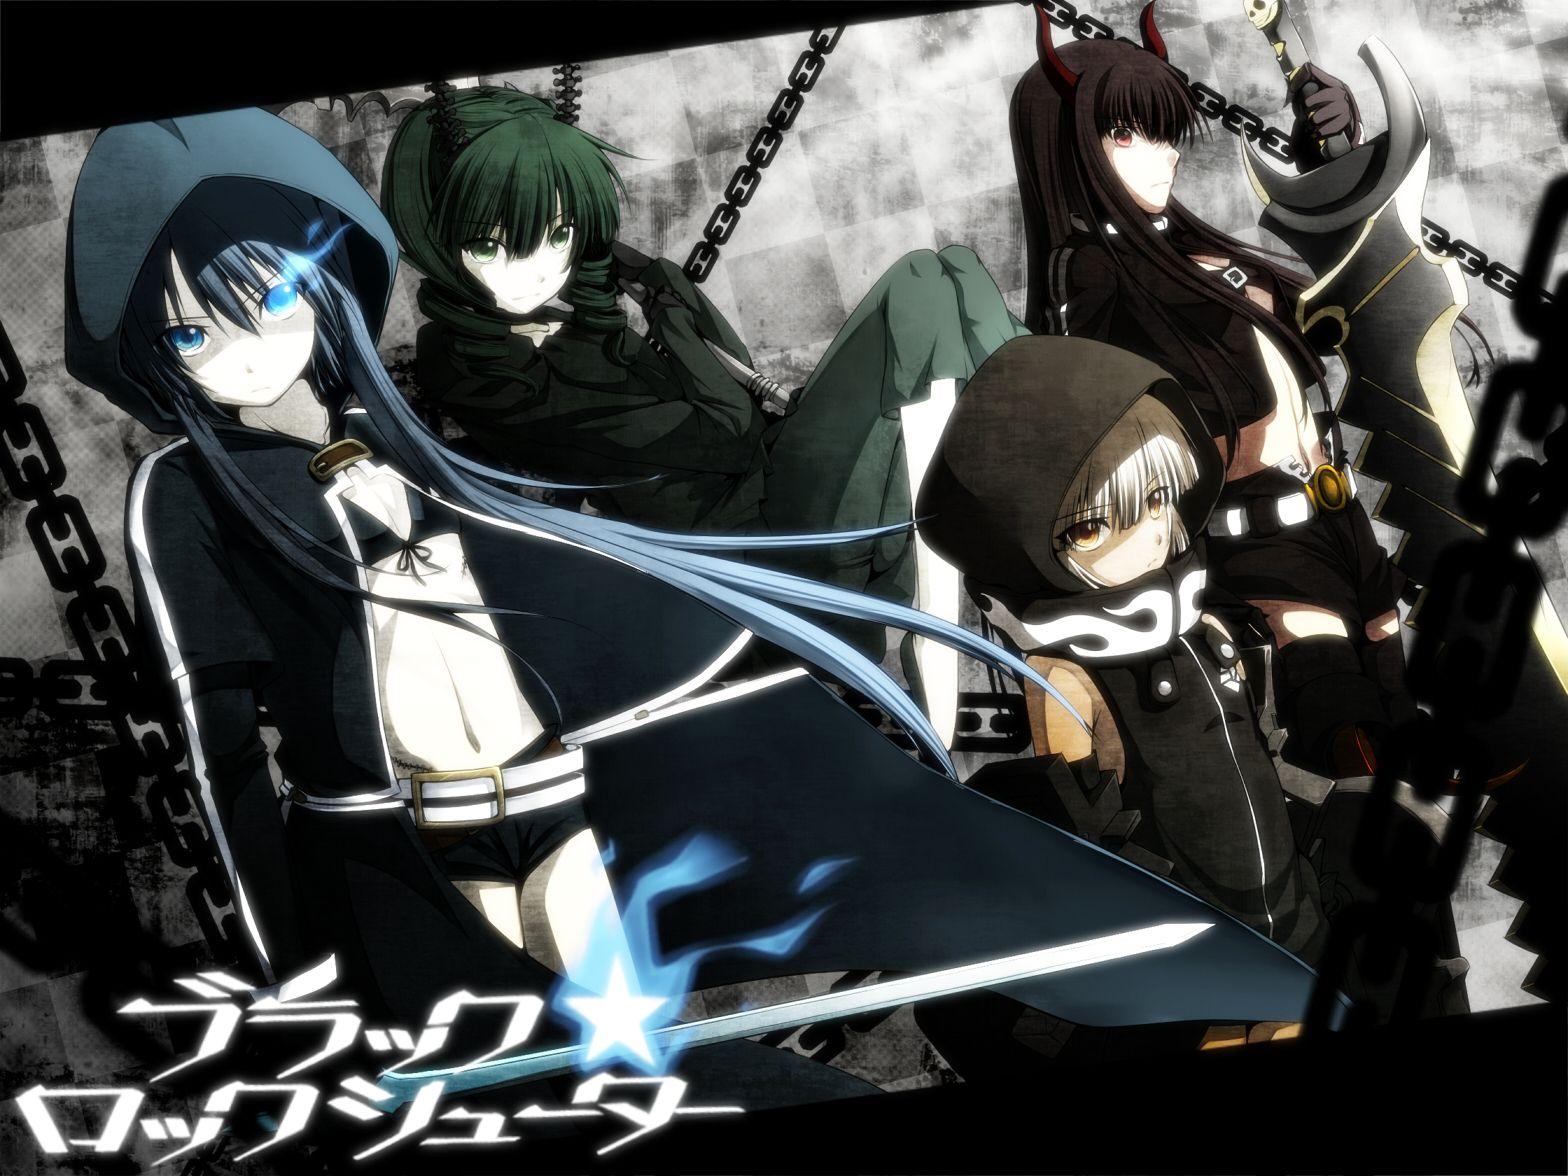 Brs Vs Wrs Black Rock Shooter Photo Fanpop - Anime black rock shooter black rock shooter ova anime